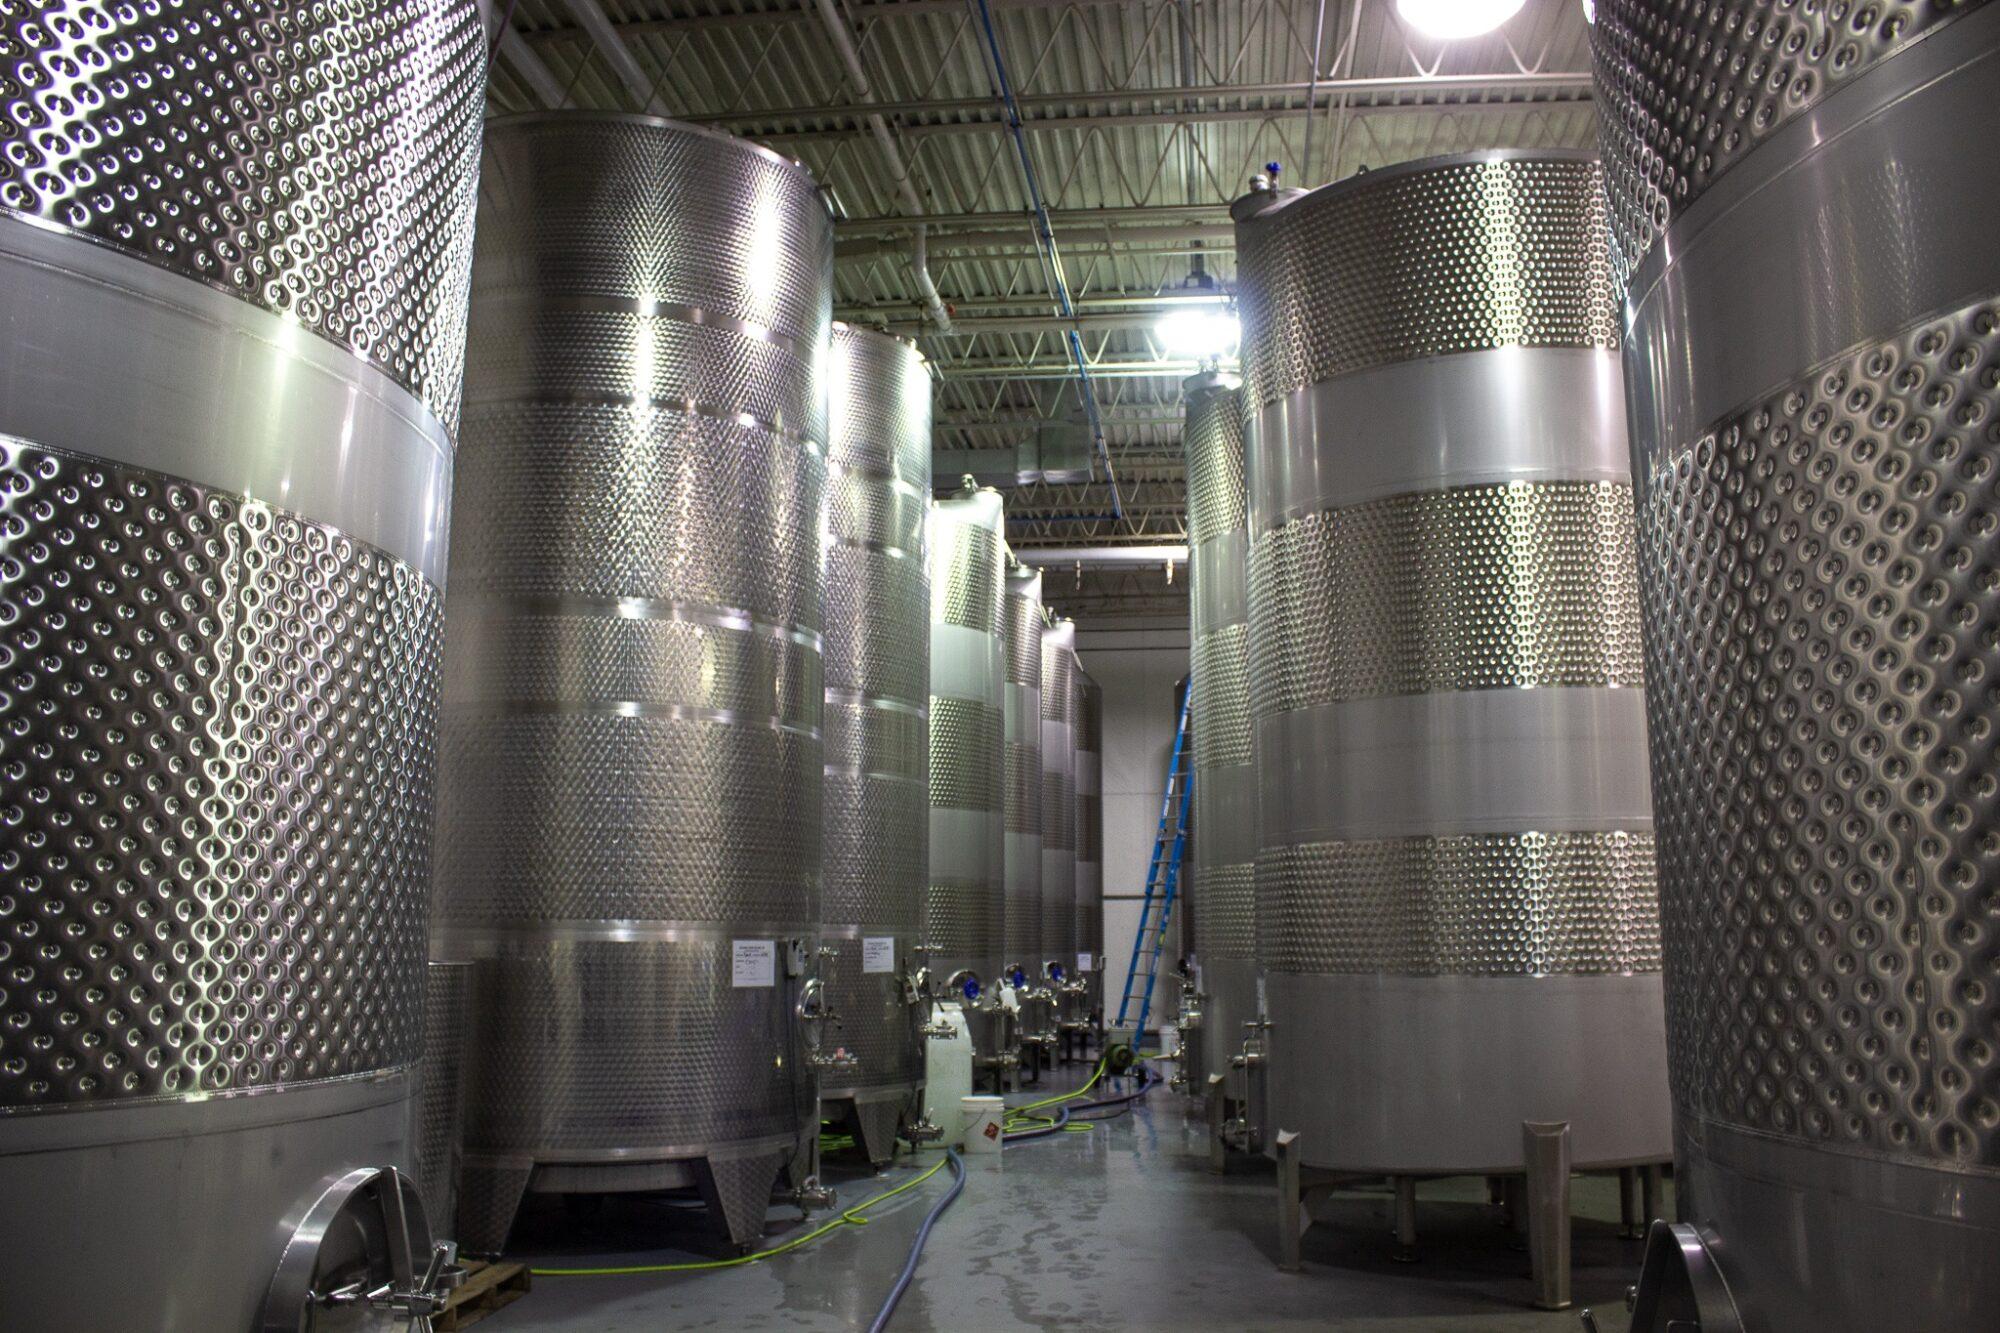 Production Line with 60,000 gallon fermentation tanks